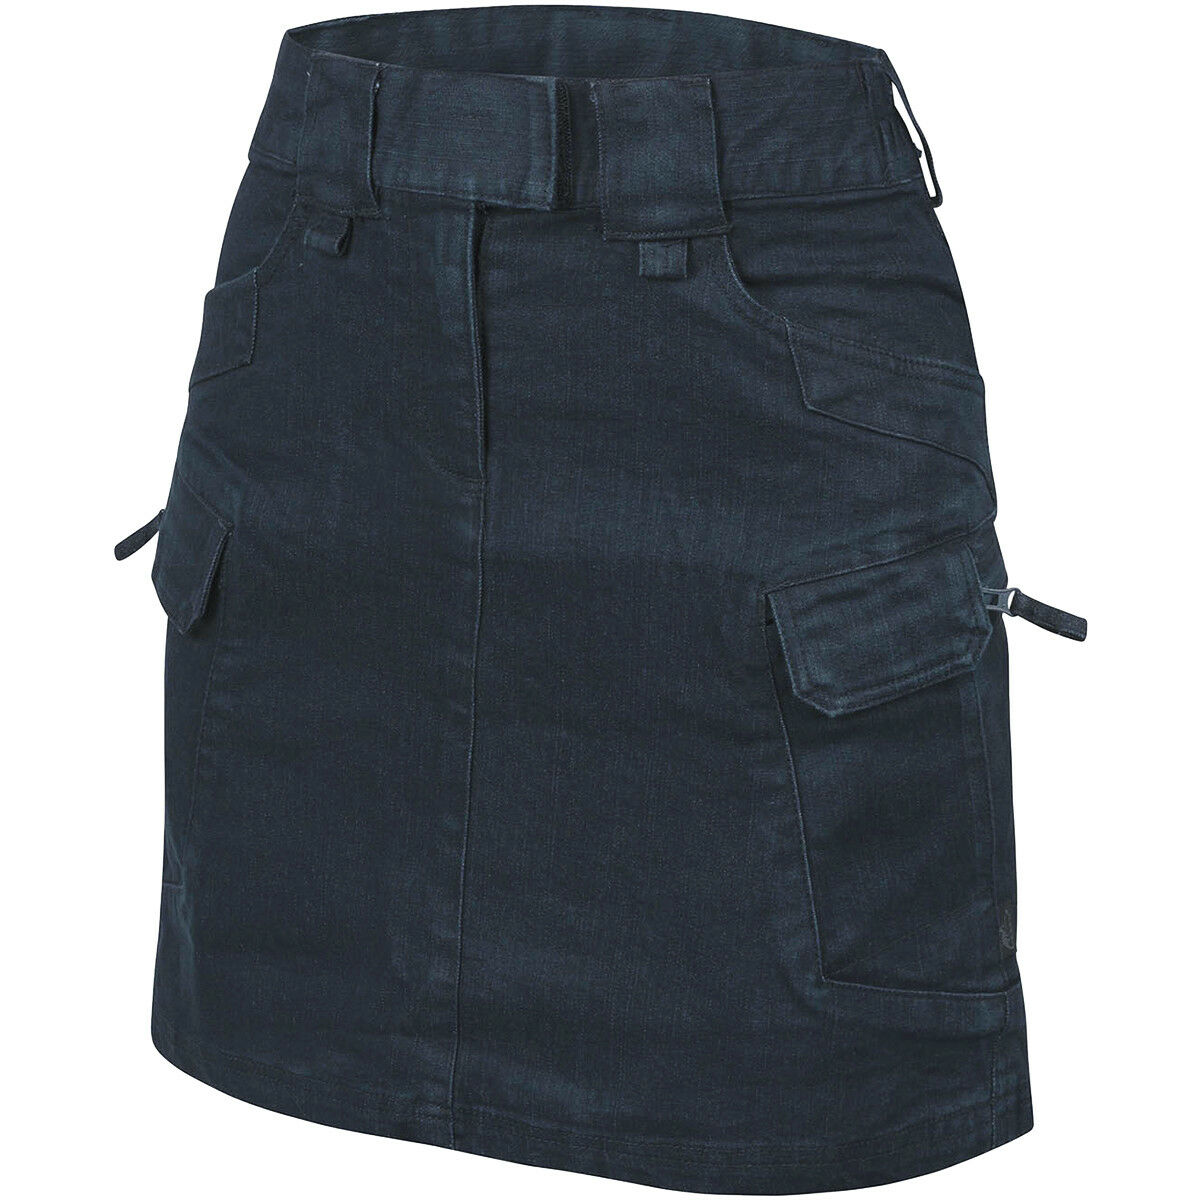 Helikon Women's Urban Tactical Skirt Tactical Hiking Jeans Army Dress Denim bluee